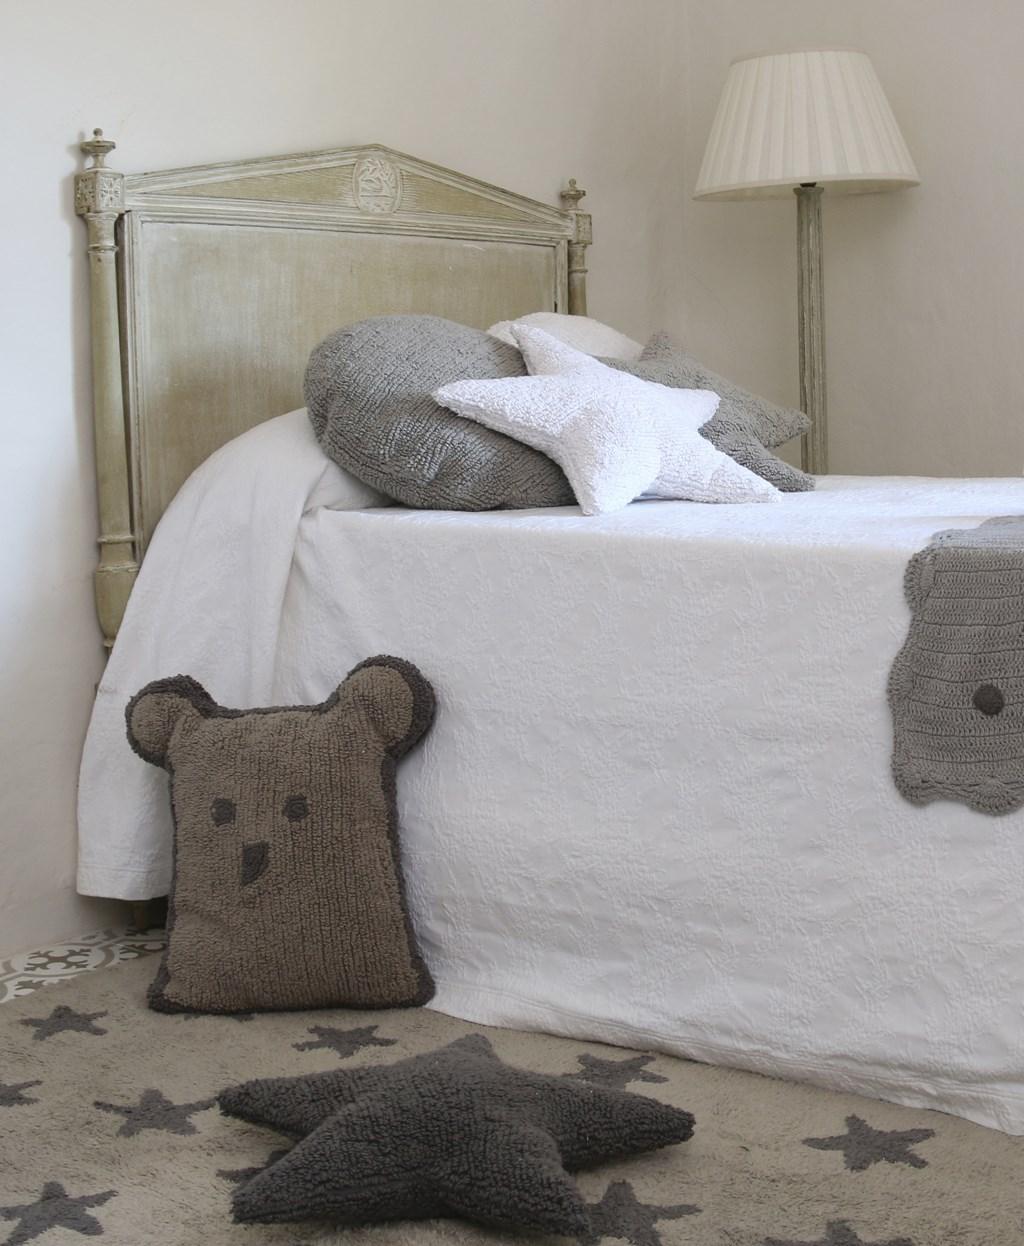 Lorena canals alfombras lavables - Alfombras lavables lorena canals ...